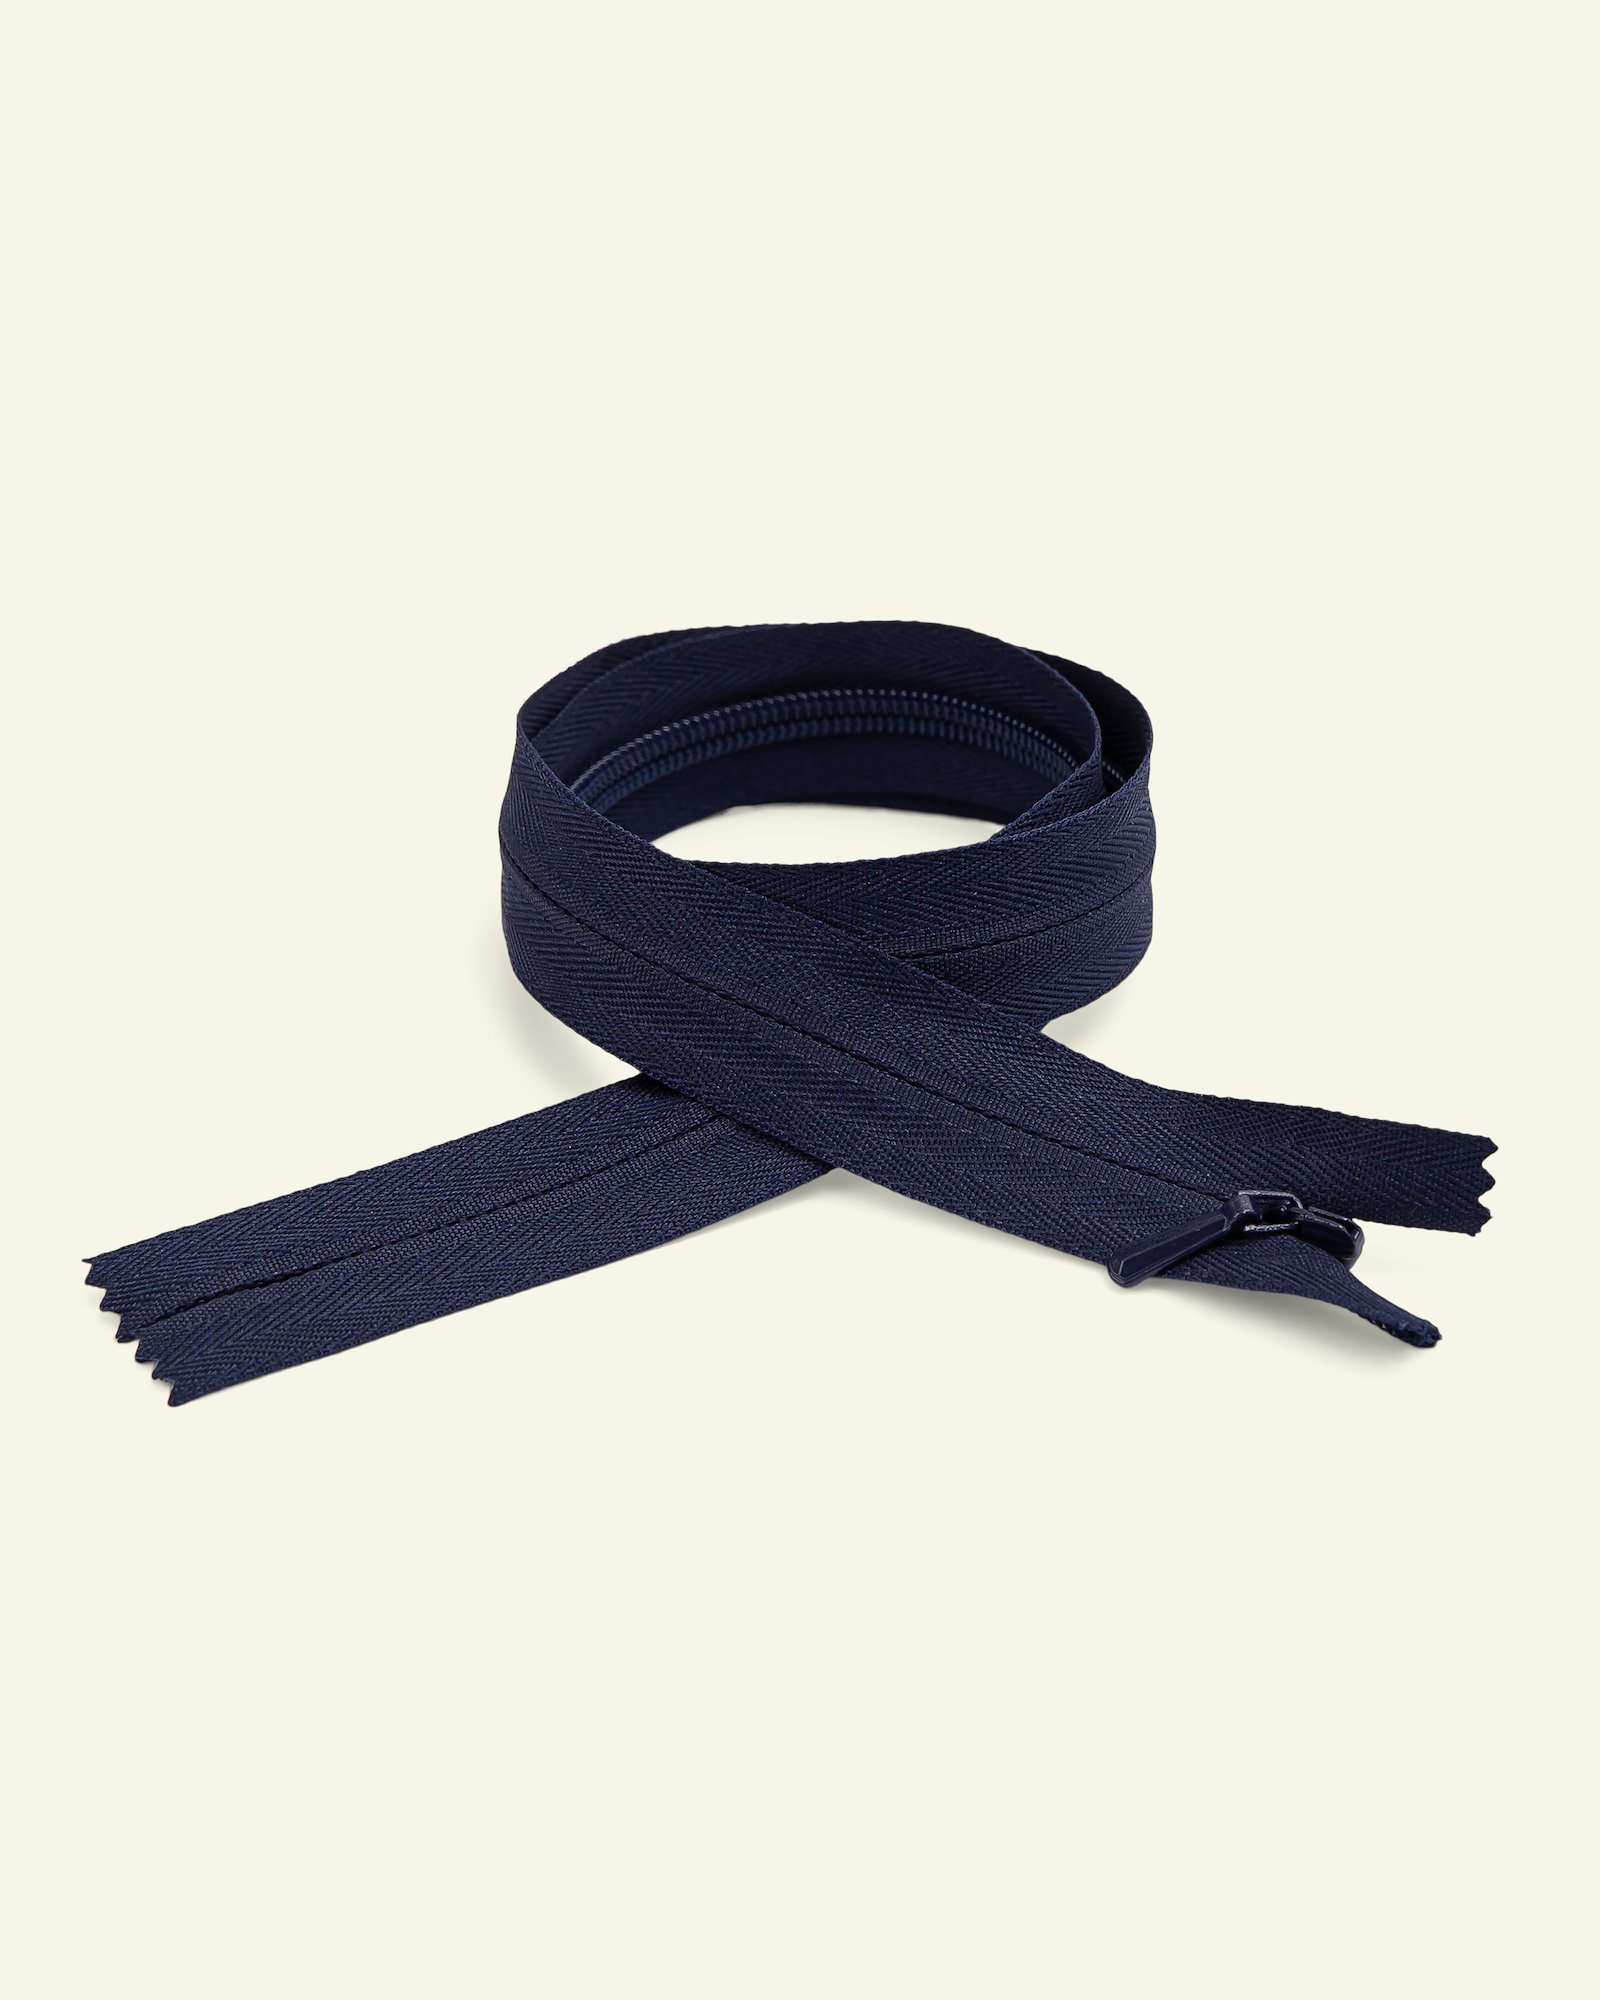 YKK zip 4mm invisible coil navy